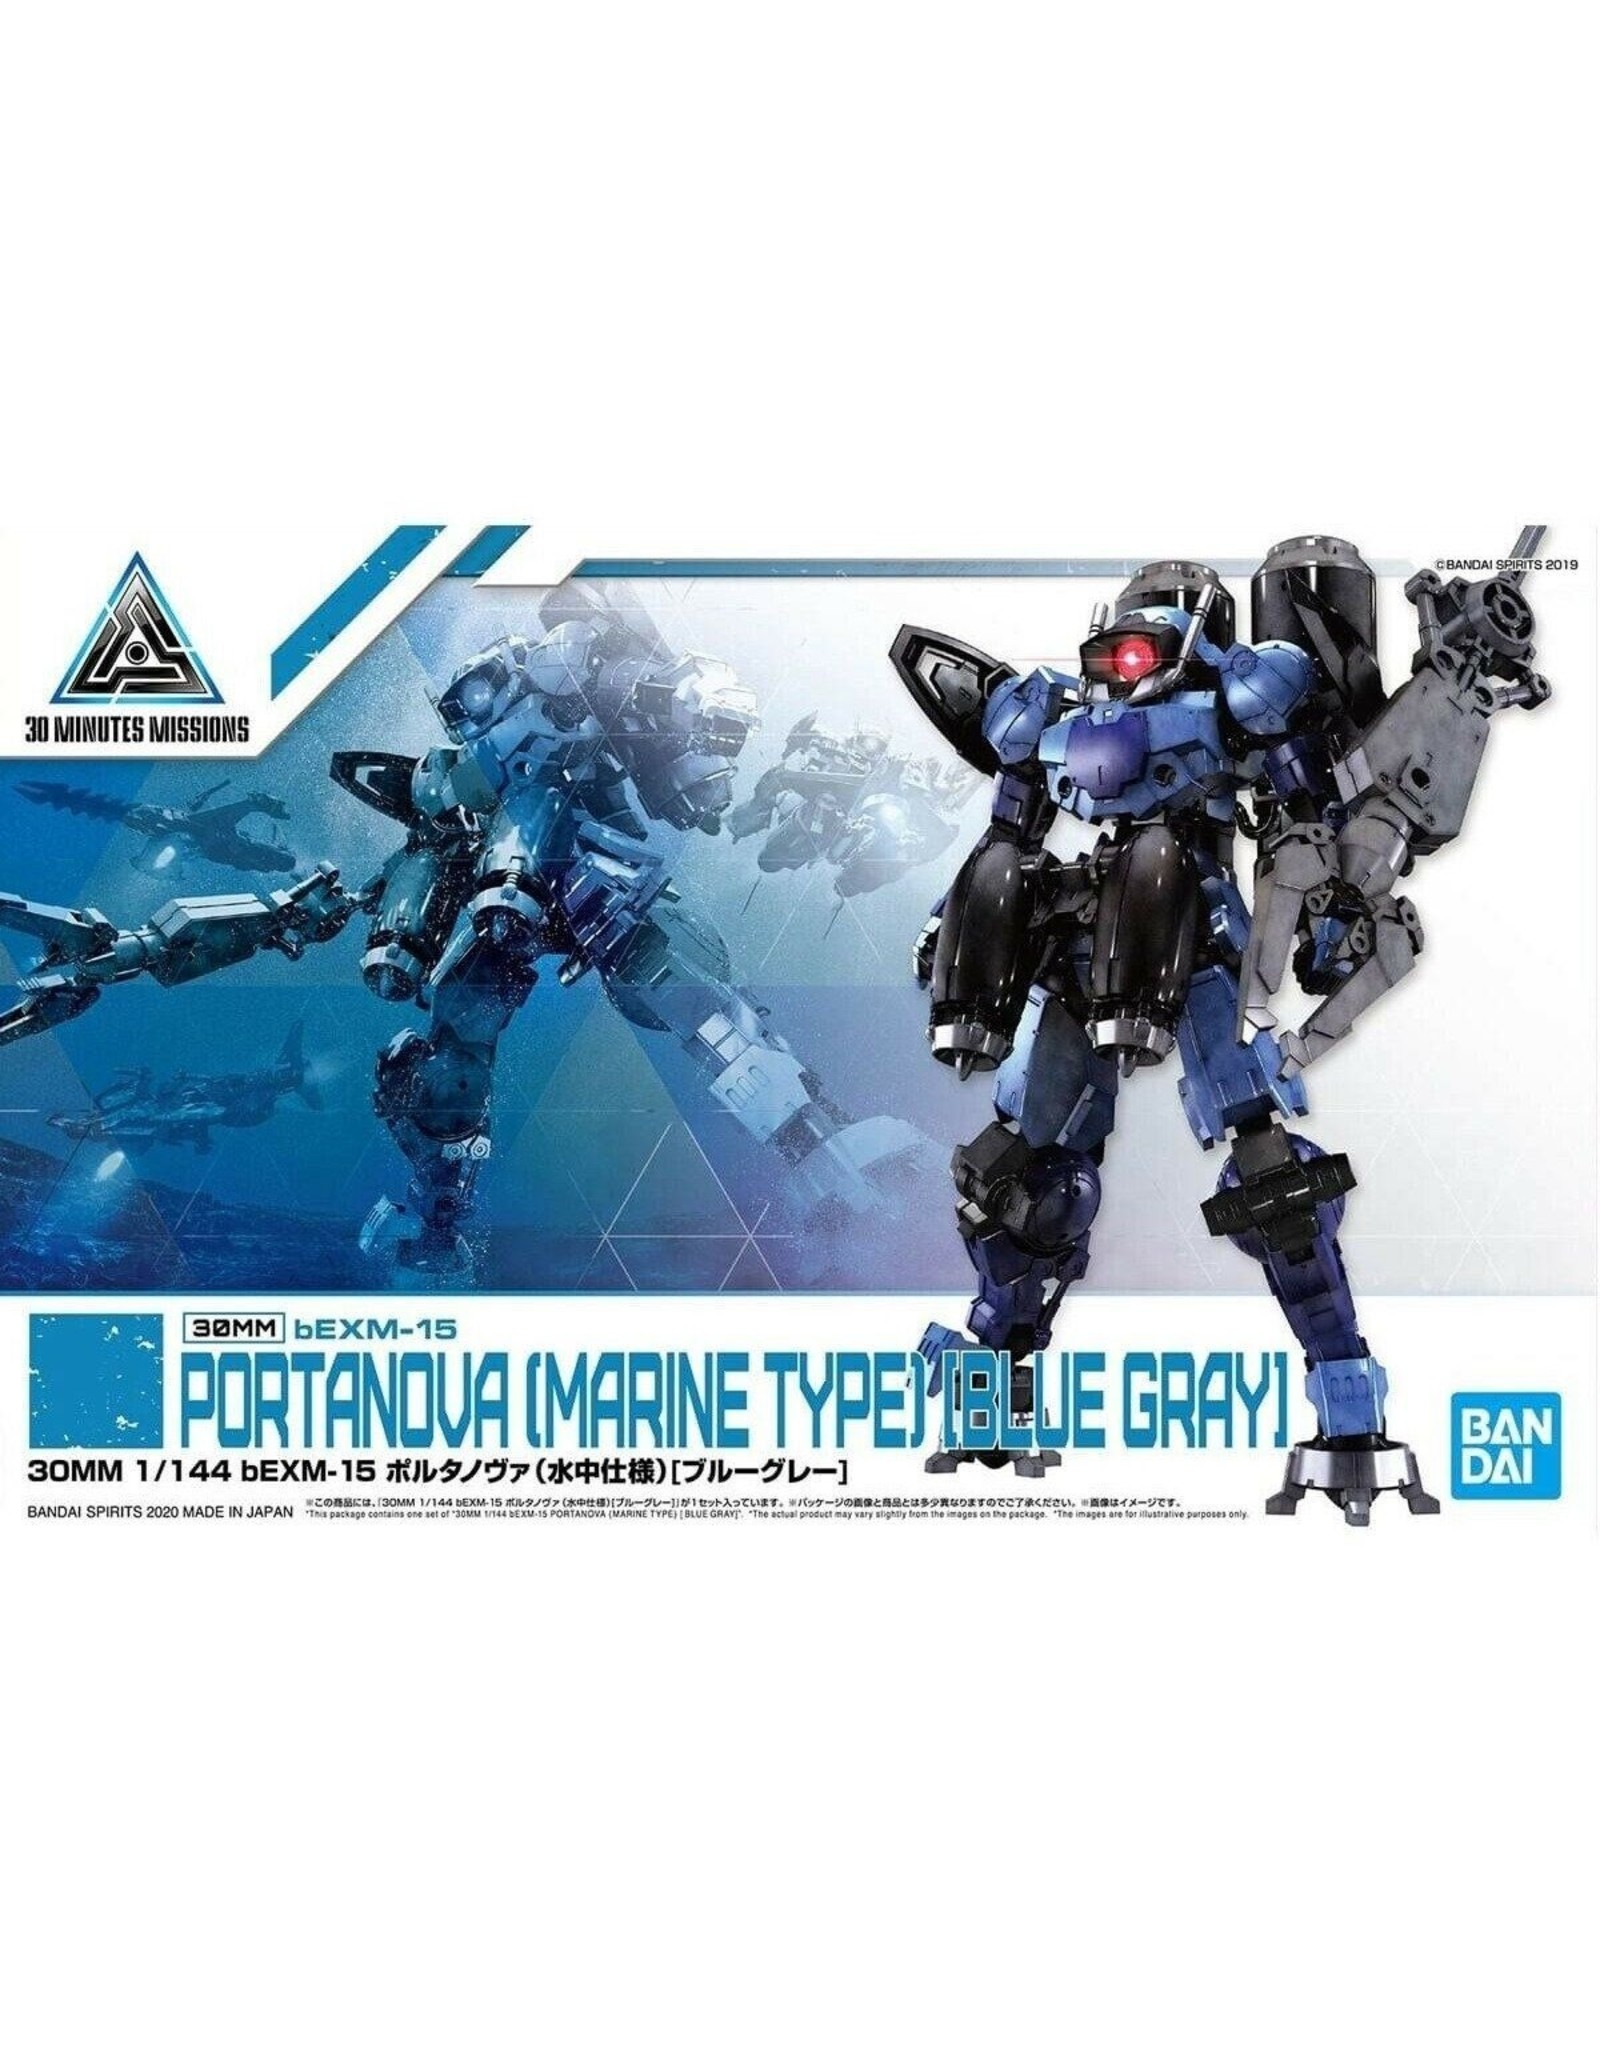 "Bandai ""Portanova (Marine Type)(Blue Grey)"" Gundam Model Kit; 30MM 1/144 bEXM-15"